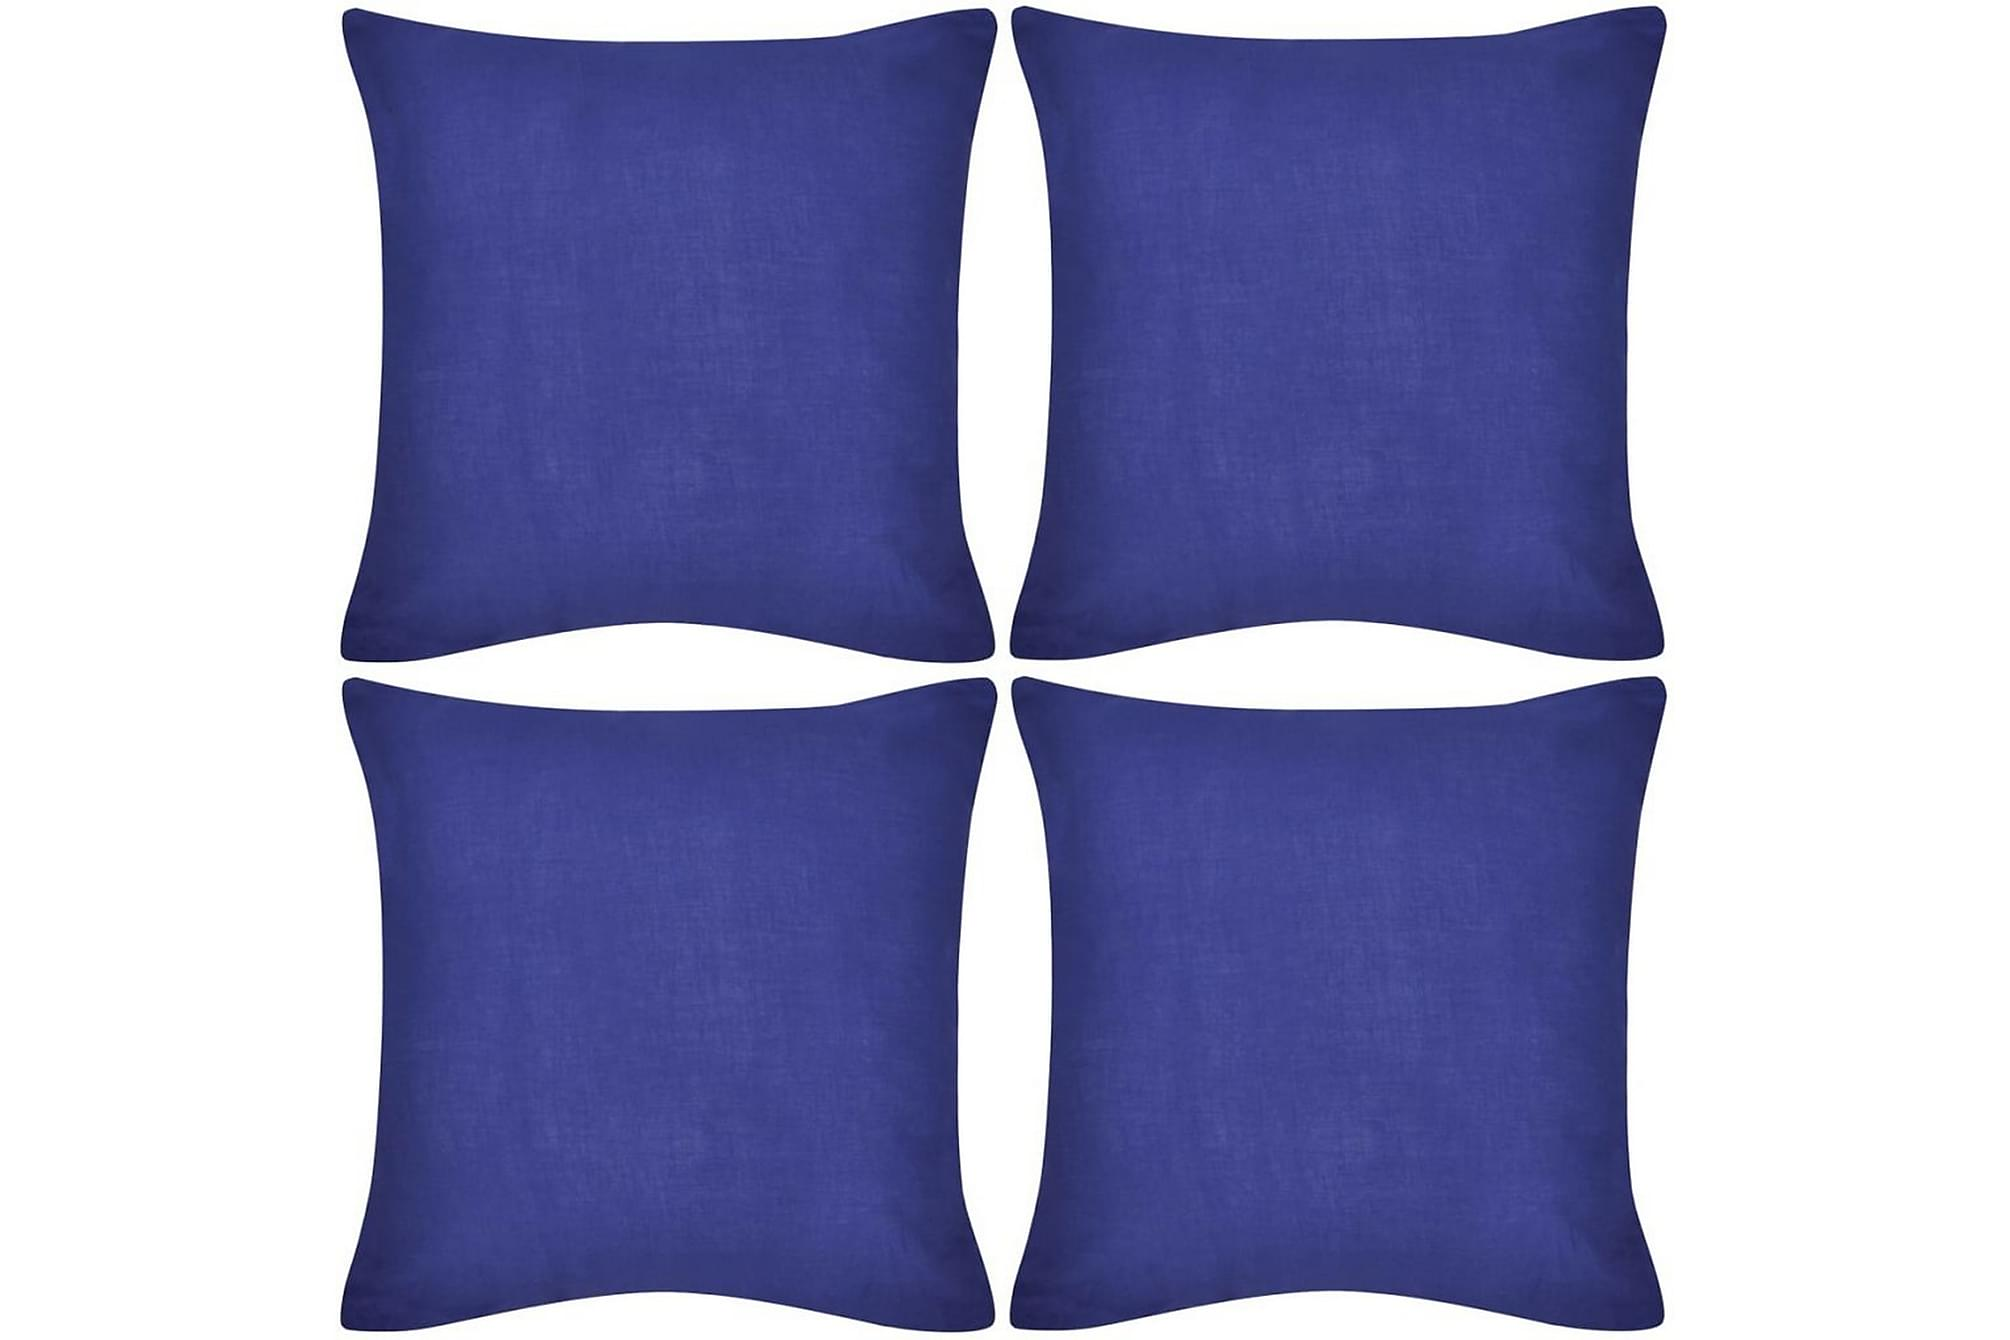 4 Kuddöverdrag i bomull blåa 50 x 50 cm, Prydnadskuddar & filtar